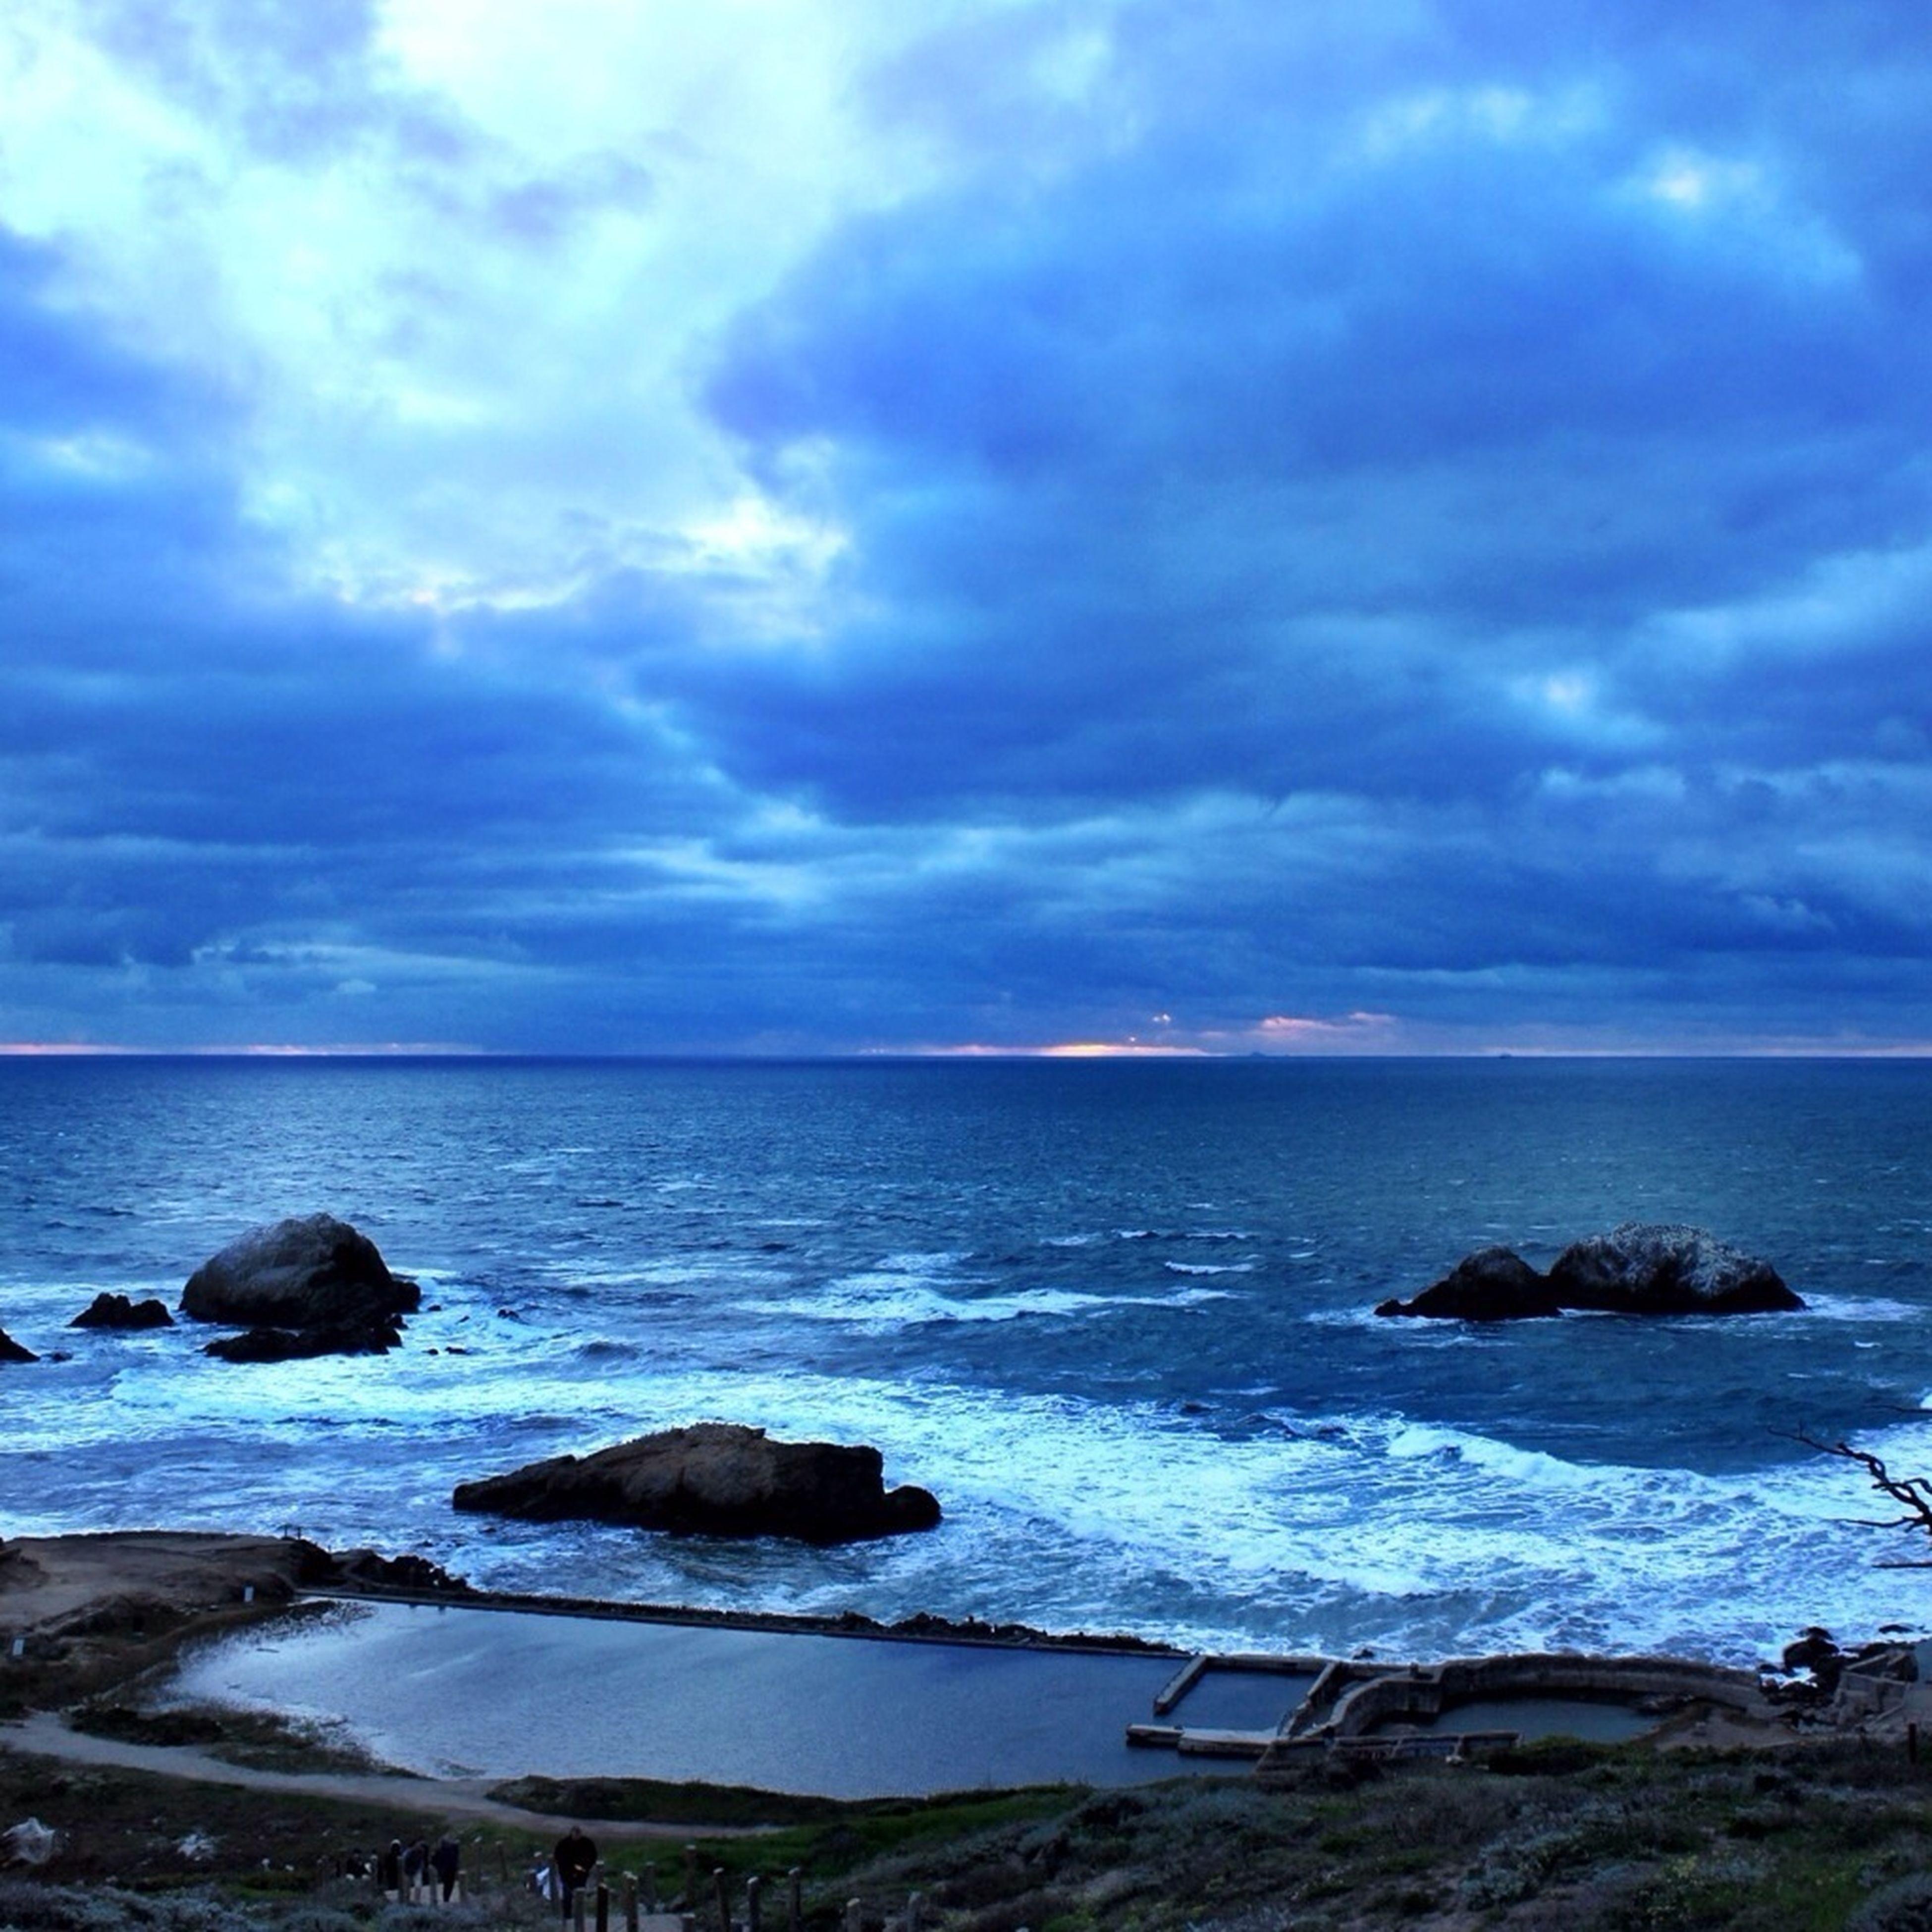 sea, horizon over water, sky, water, scenics, tranquil scene, beauty in nature, beach, cloud - sky, tranquility, shore, cloudy, nature, cloud, blue, idyllic, coastline, rock - object, seascape, wave